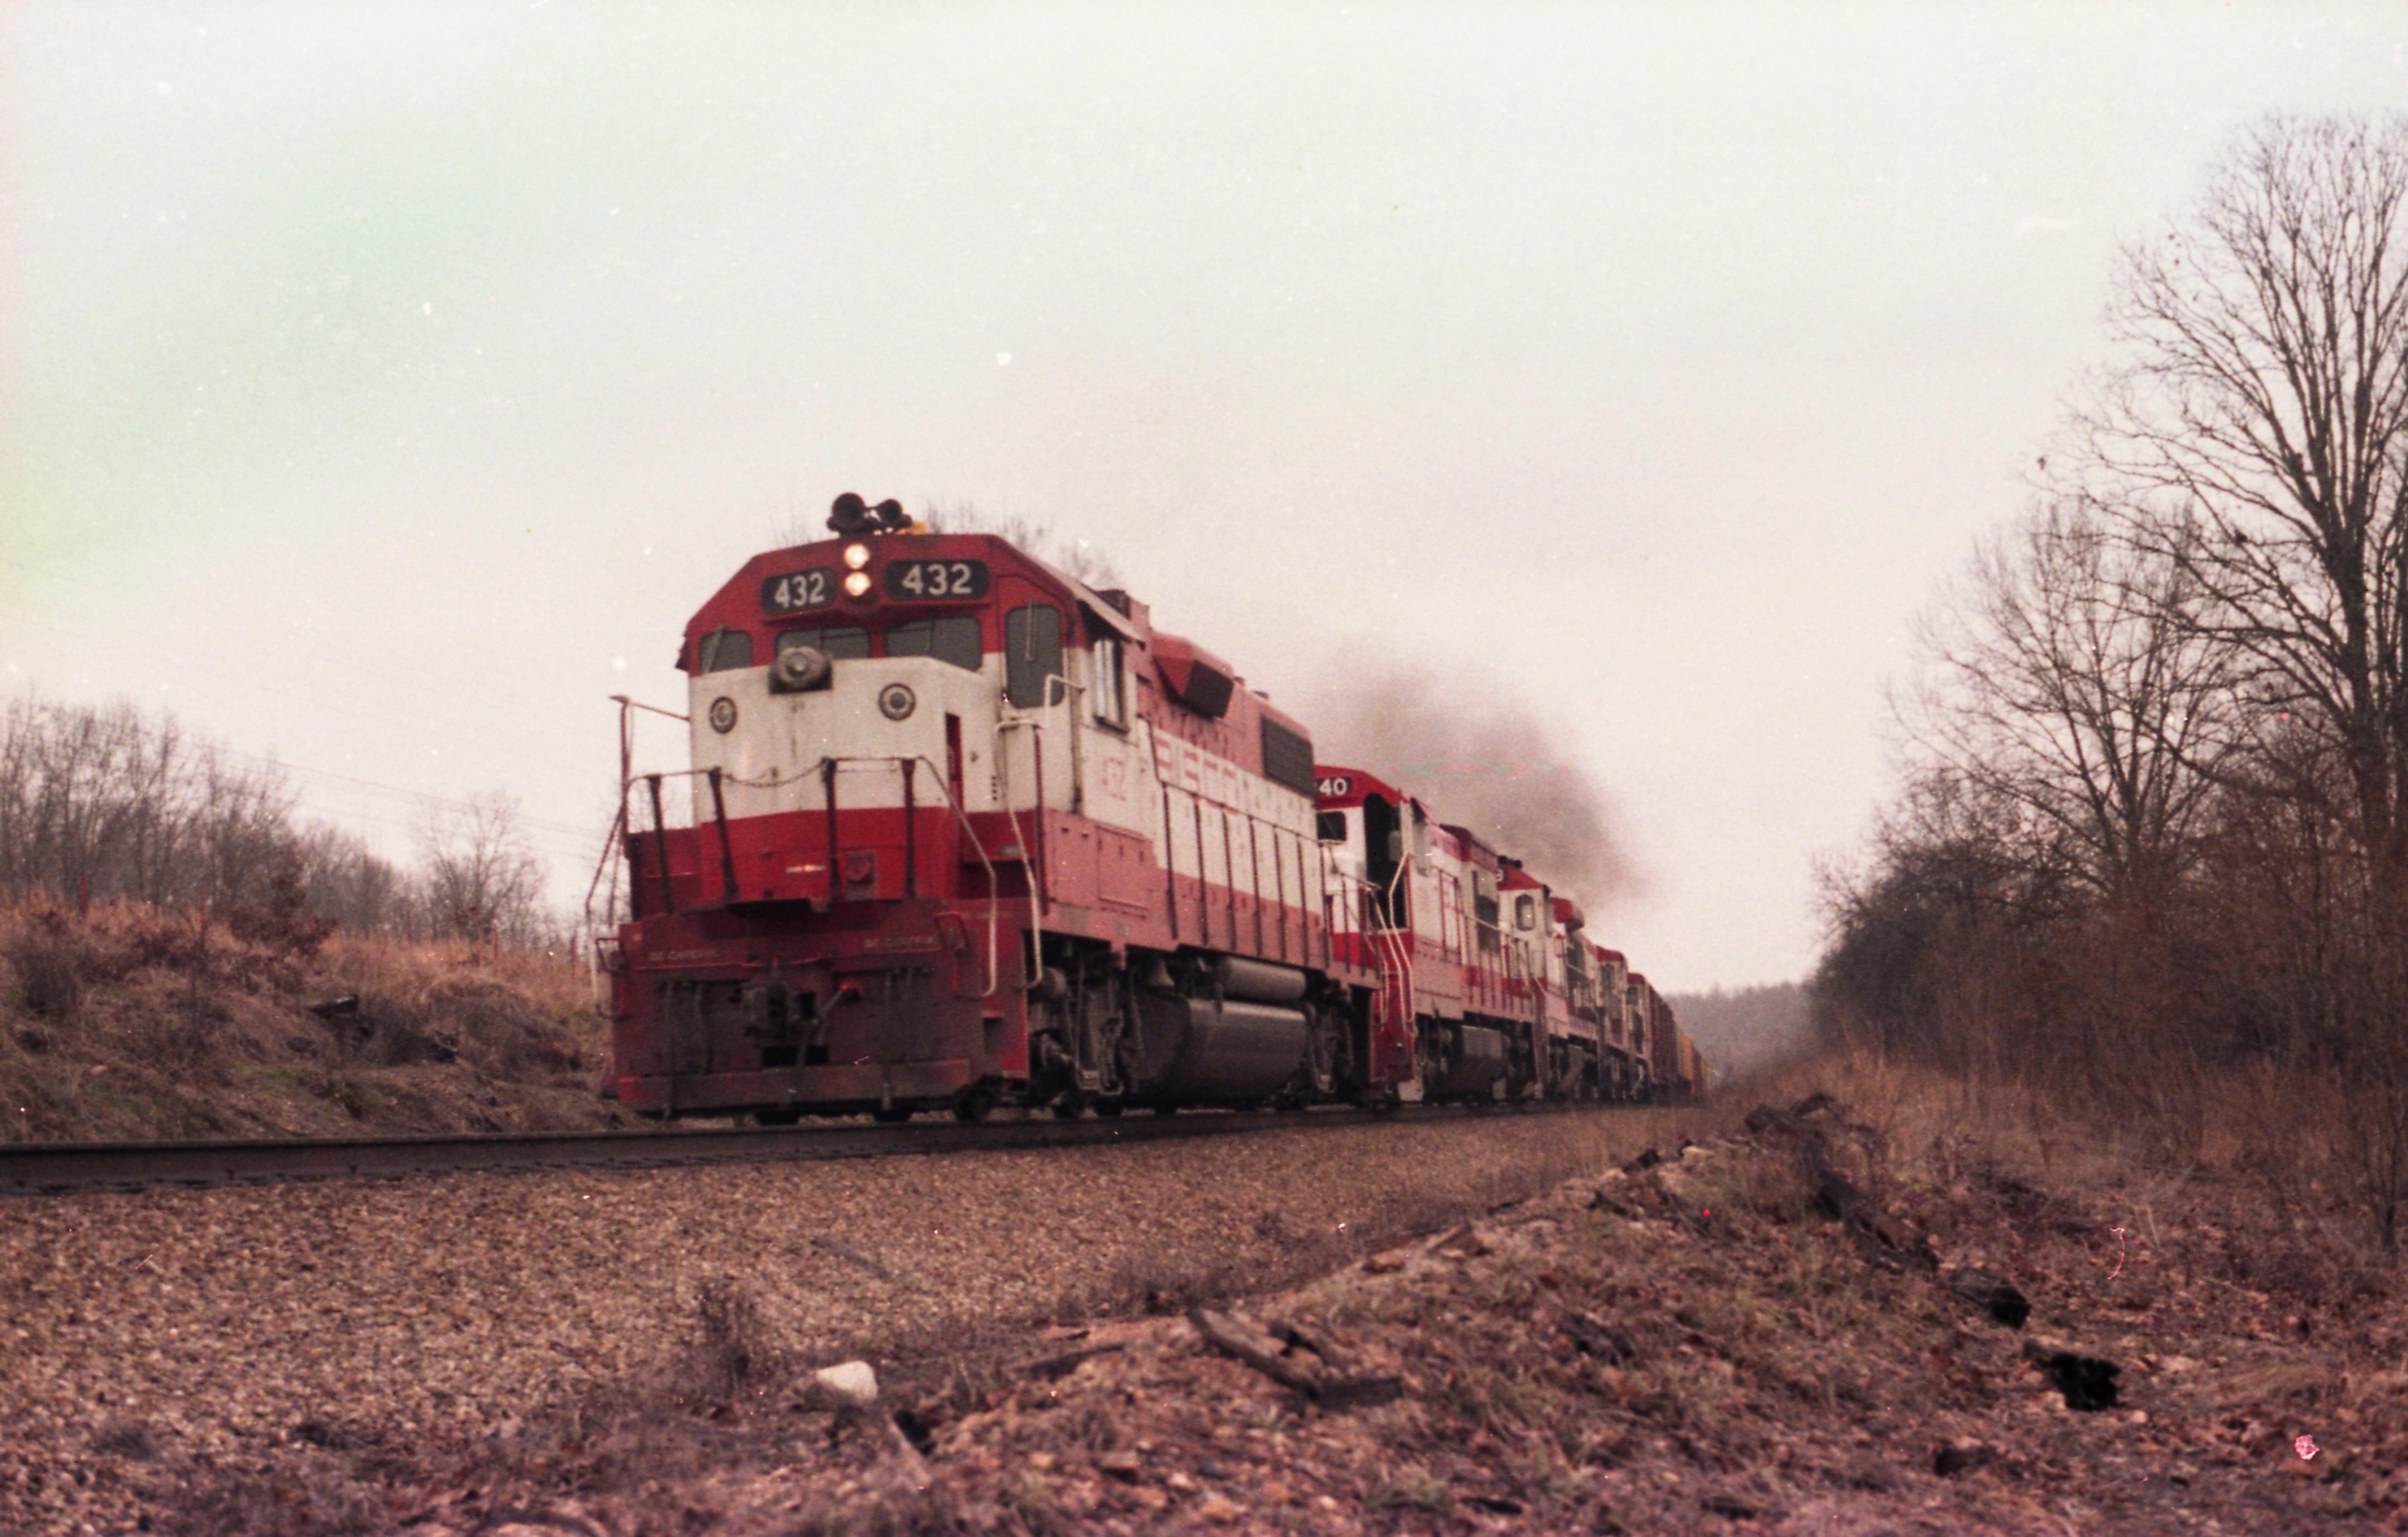 GP38-2 432, U30B 840, B30-7 869, U25B 831, B30-7 865 and Boxcar 47220 North of Thayer, Missouri on December 31, 1979